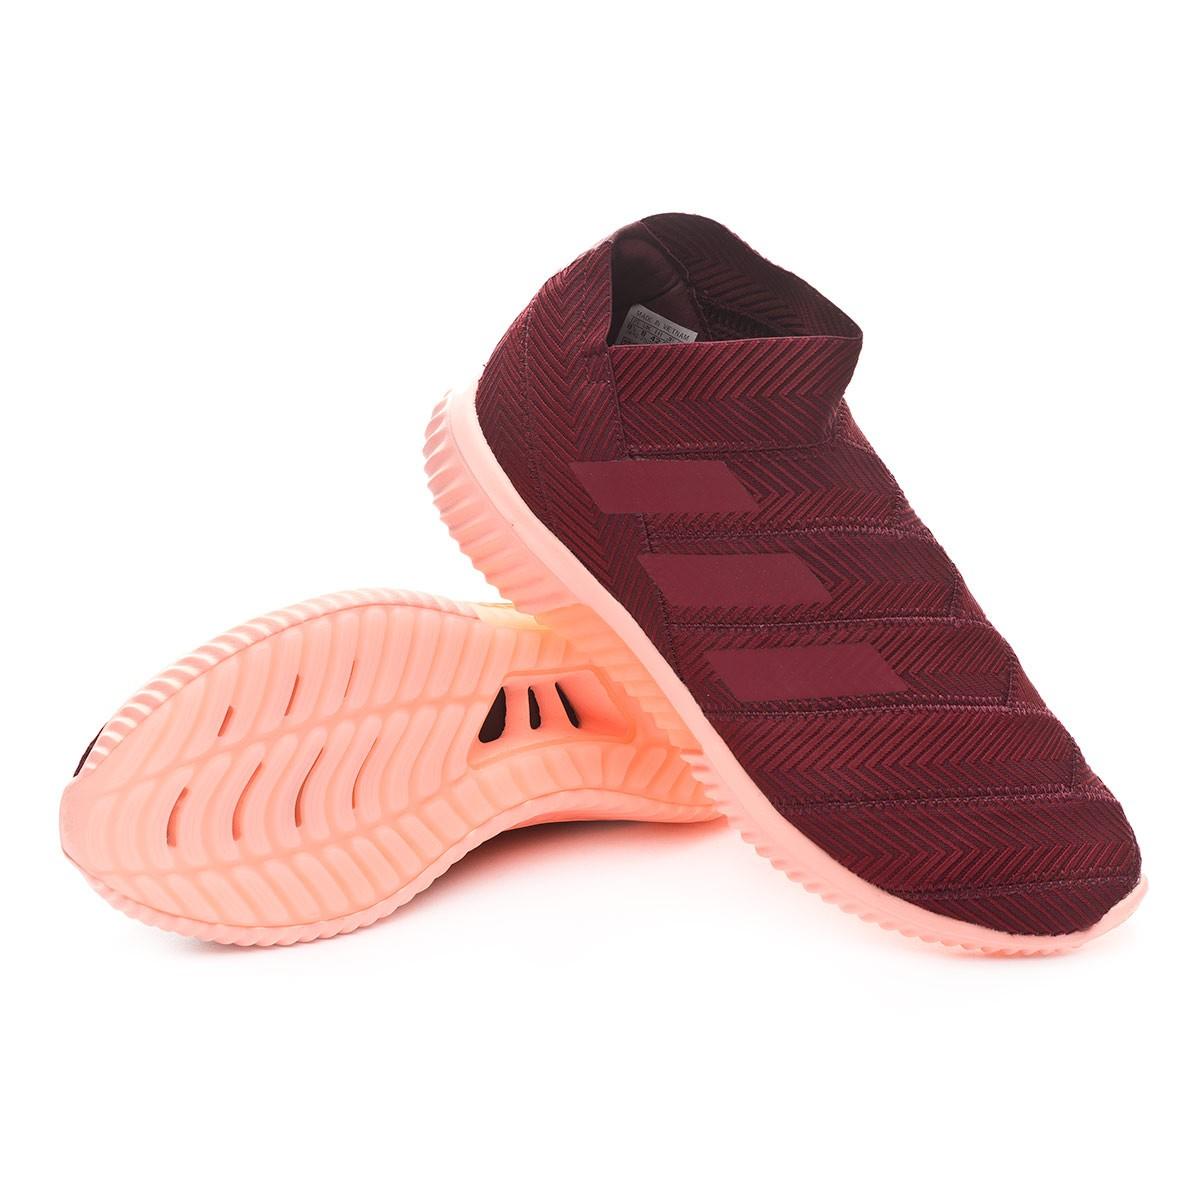 e53433c45 Trainers adidas Nemeziz Tango 18.1 TR Maroon-Collegiate burgundy-Clear  orange - Football store Fútbol Emotion